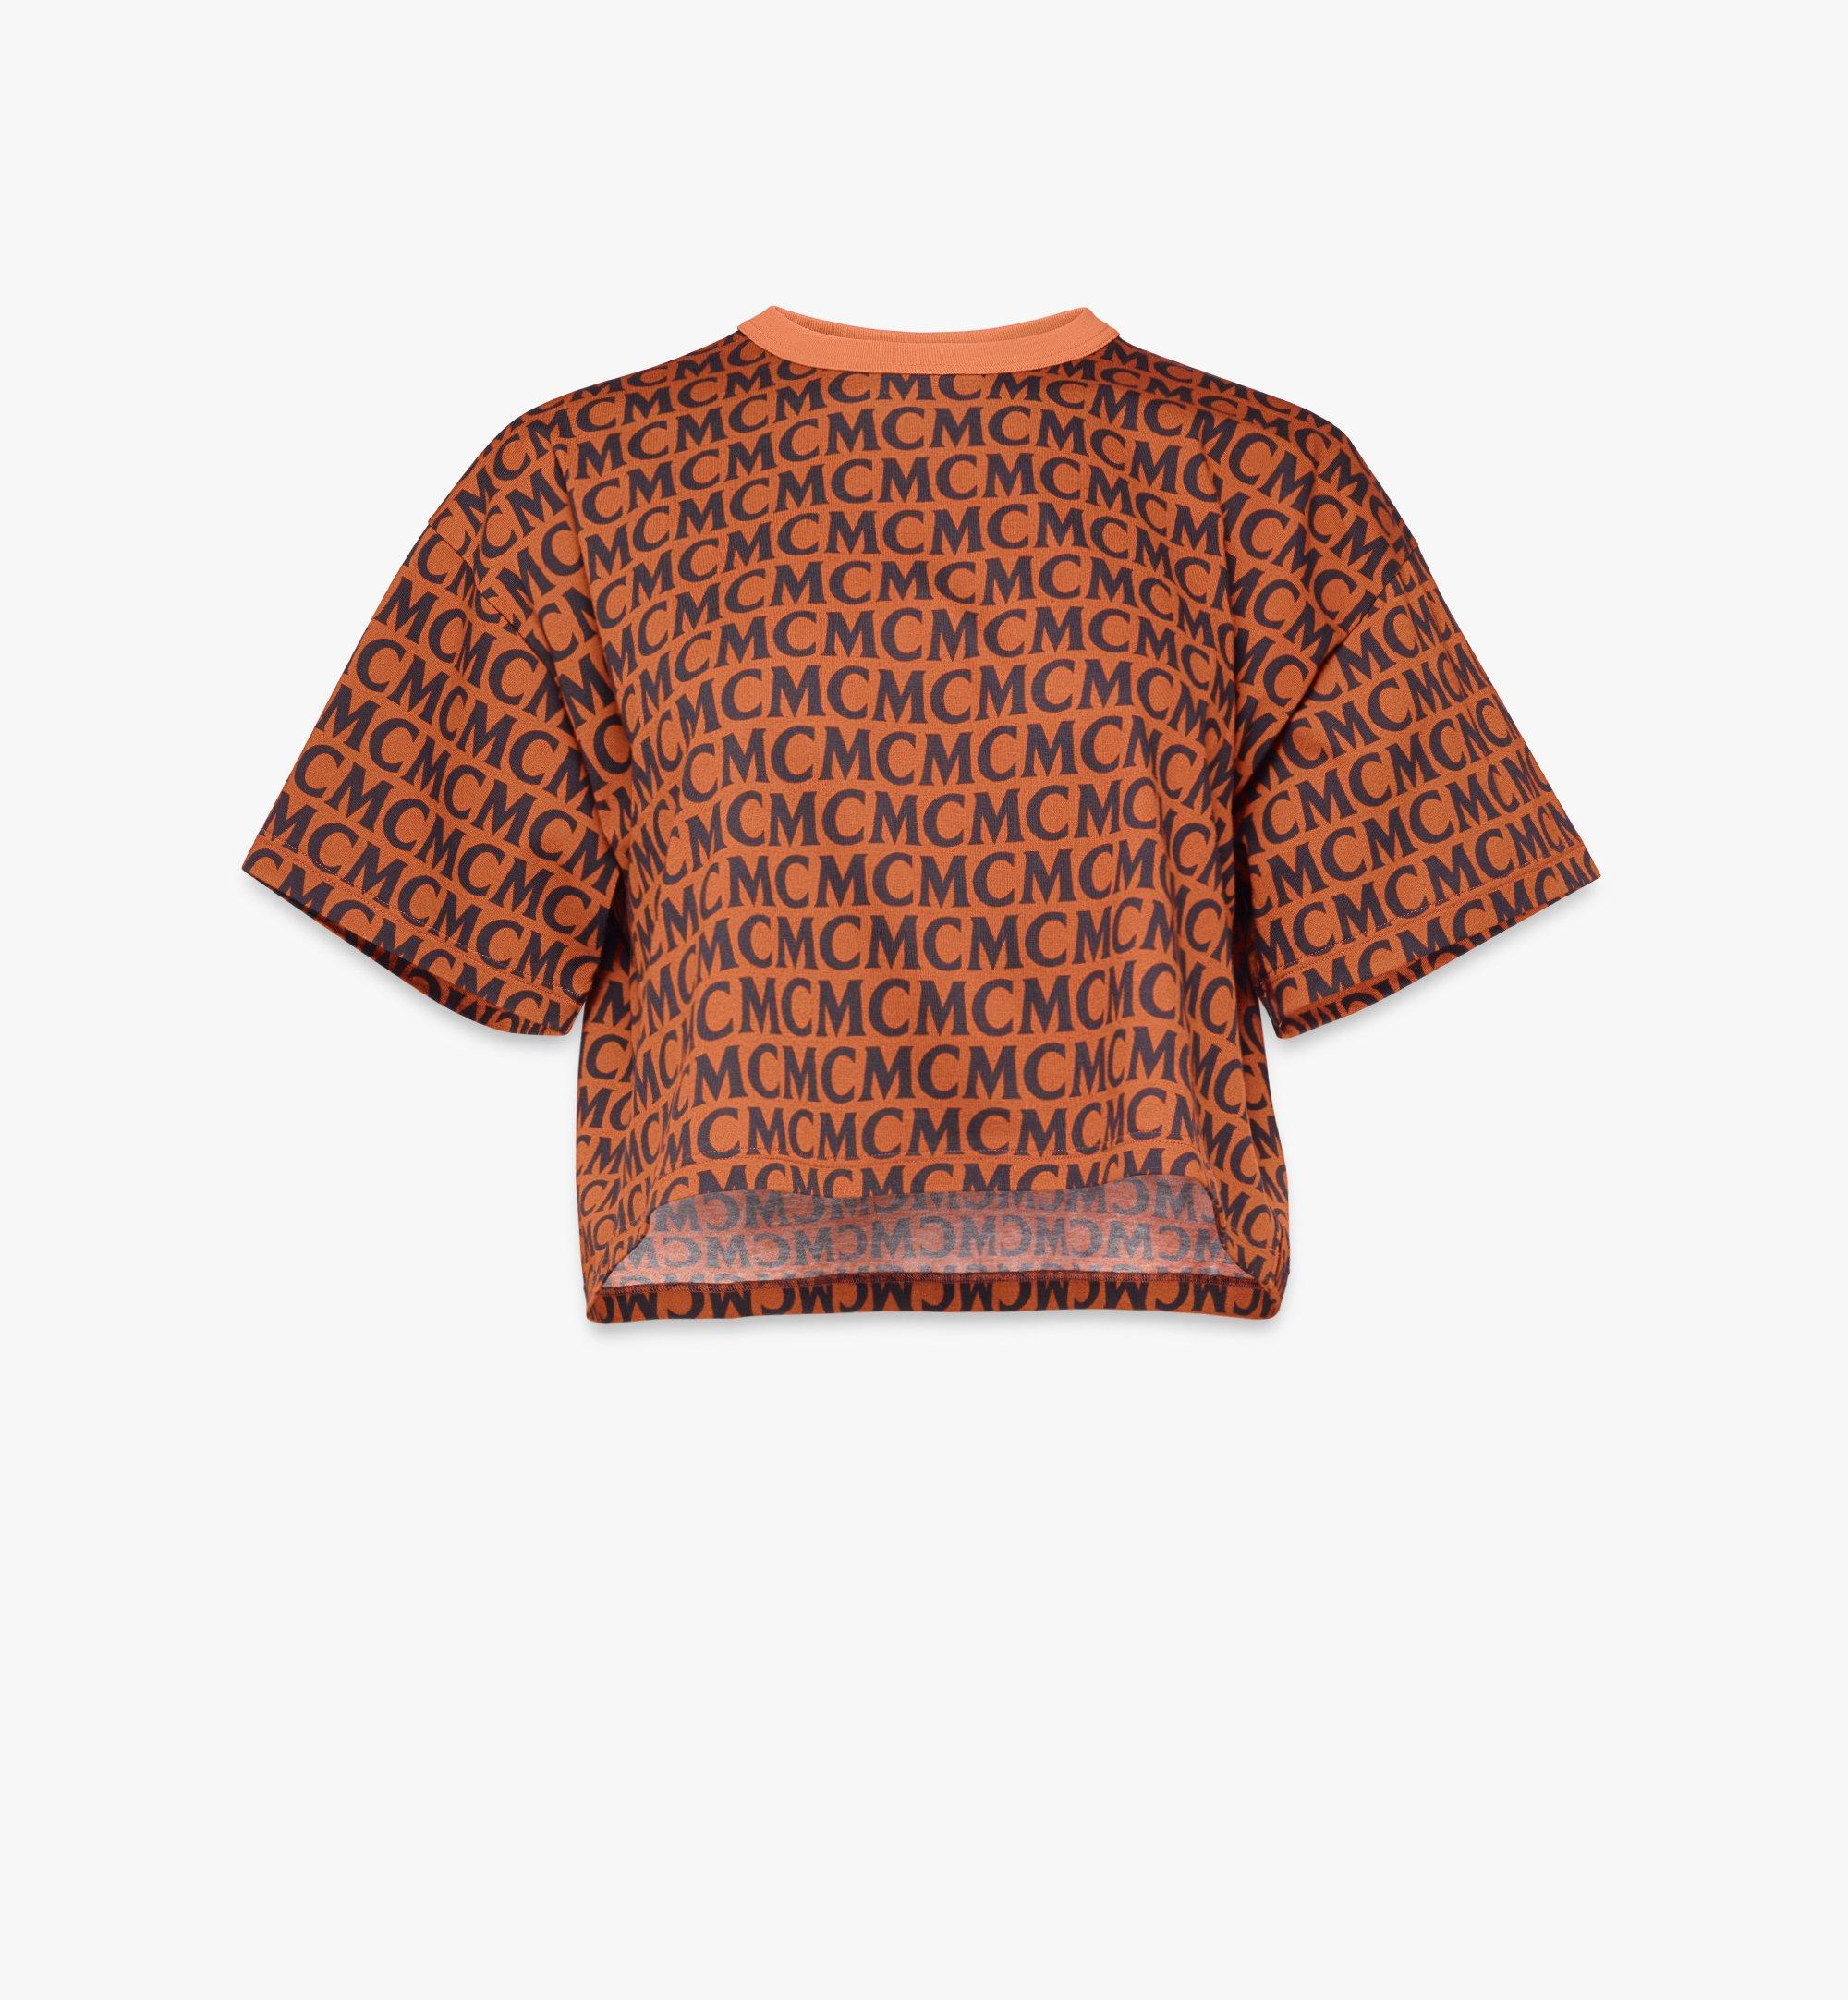 MCM T-shirt monogrammé pour femme Black MFTAAMD01C400L Alternate View 1